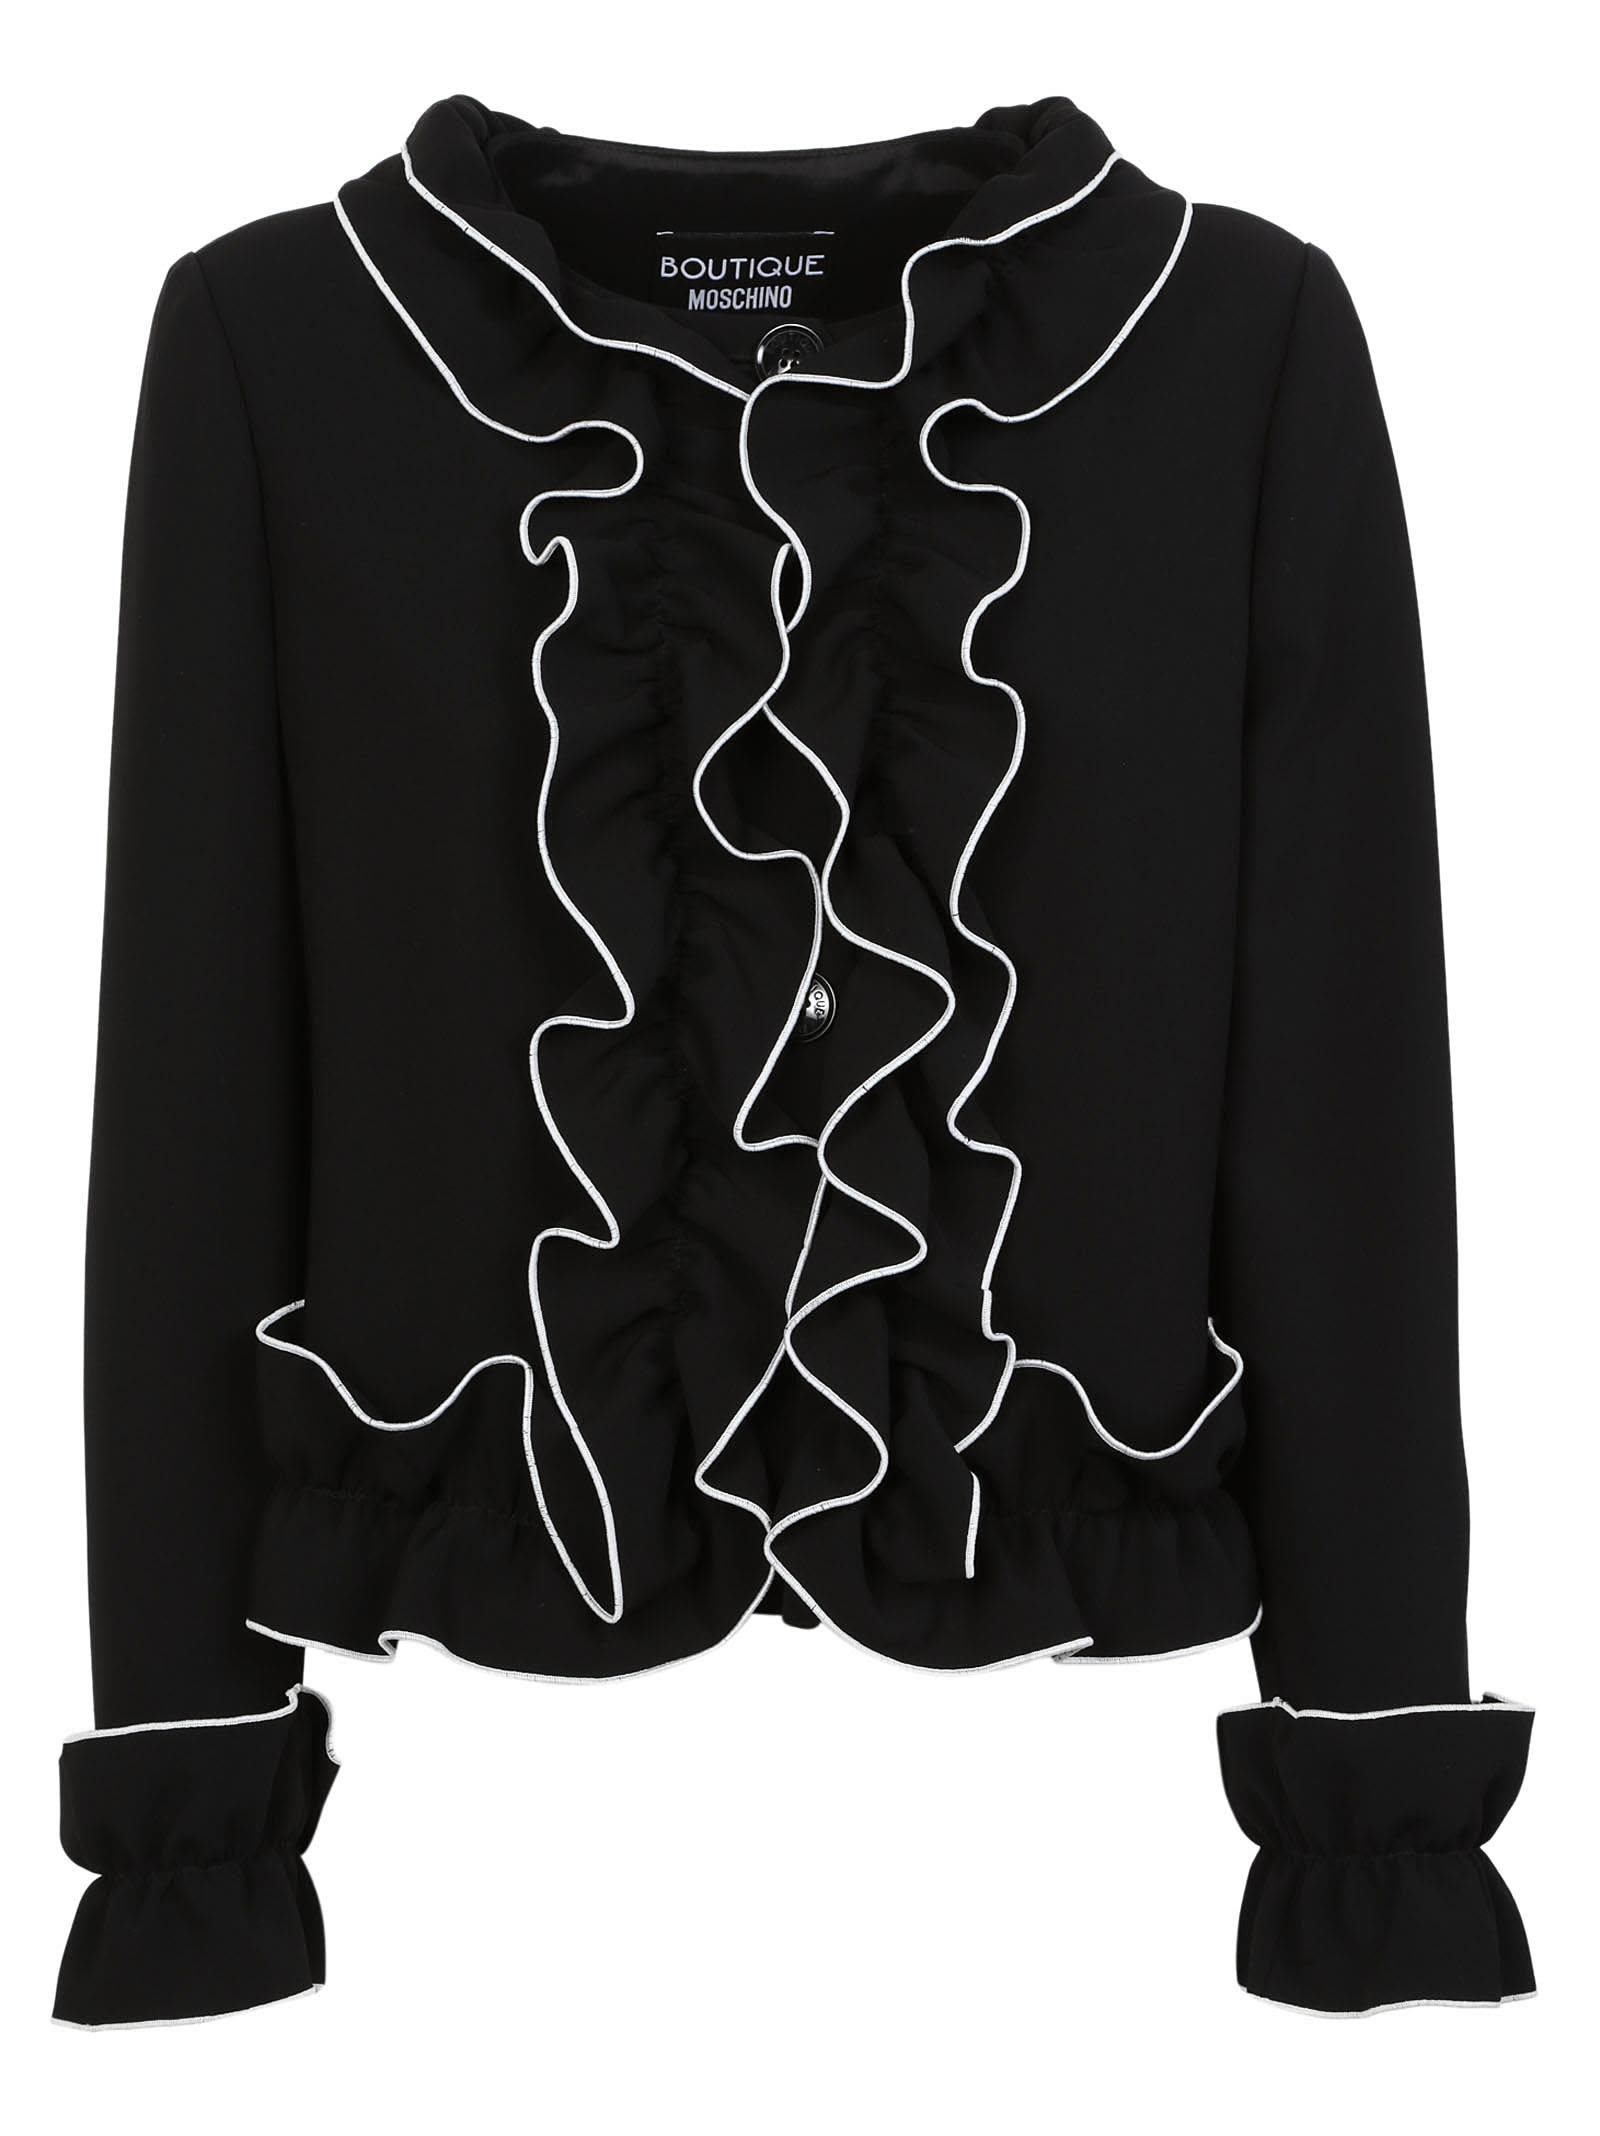 Boutique Moschino Ruffle Trim Jacket